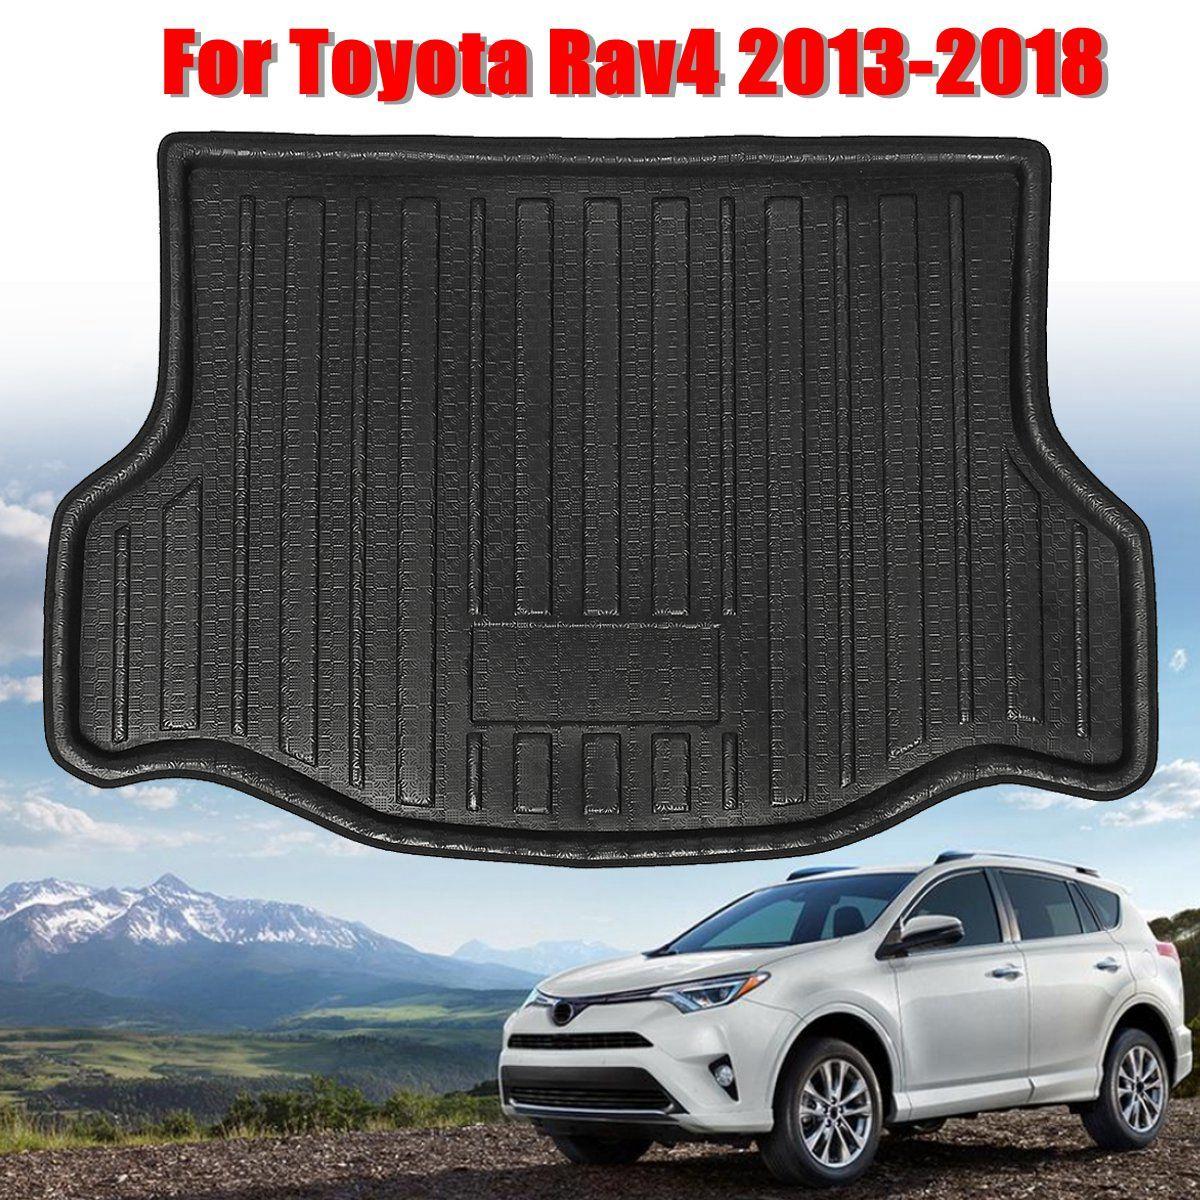 High Quality Rear Trunk Cargo Mat Floor Tray Boot Liner Waterproof for Toyota RAV4 2013 2014 2015 2016 2017 2018